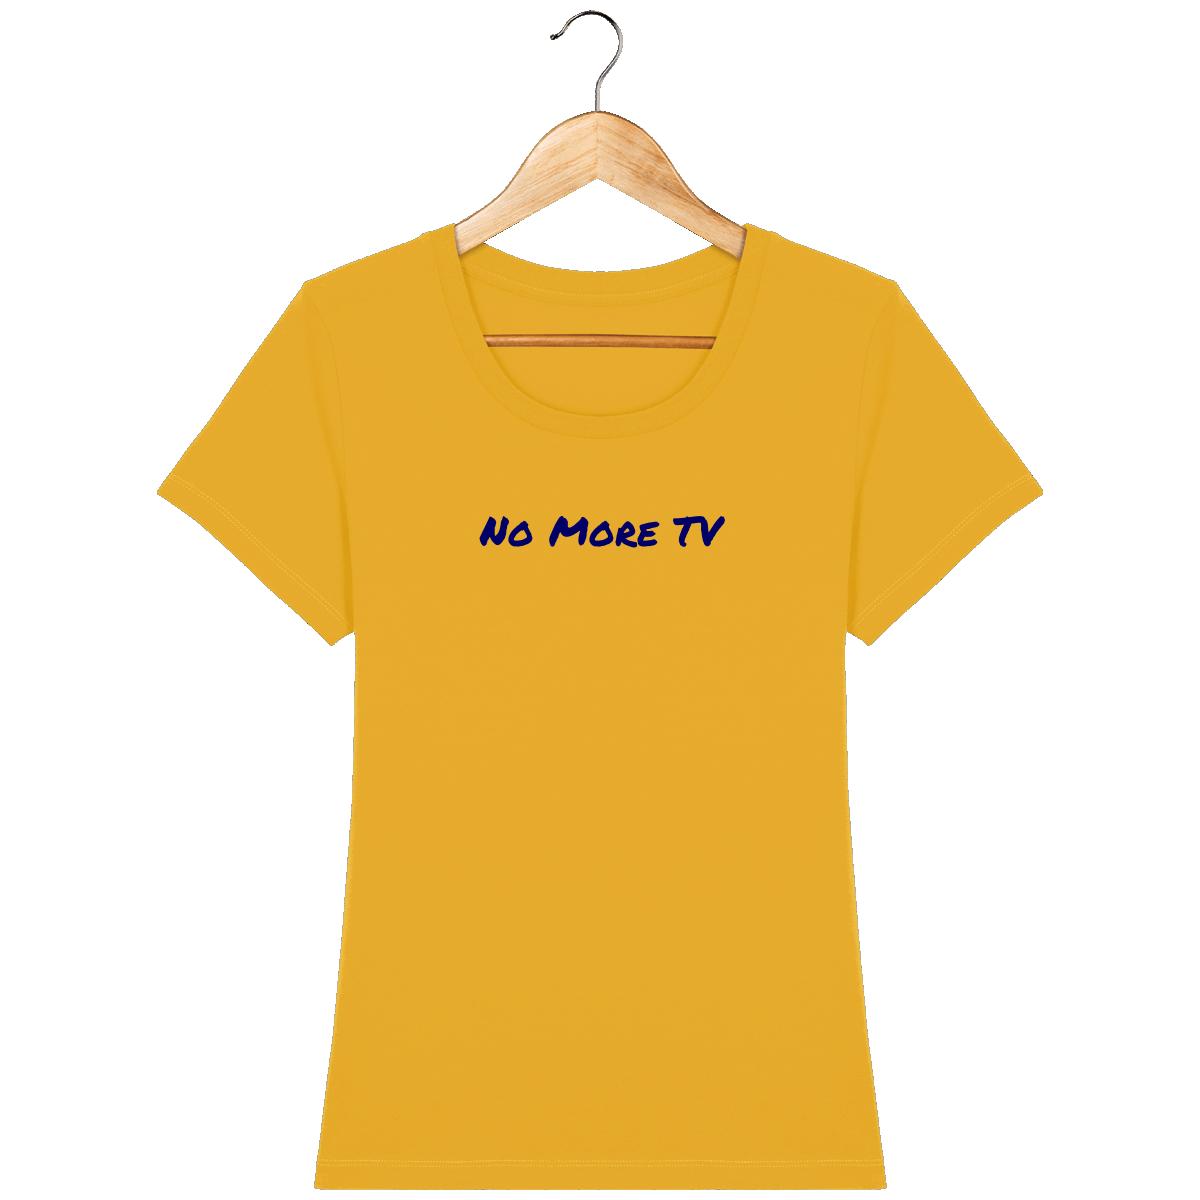 tee-shirt-bio-brode-no-more-tv-white-navy_spectra-yellow_face